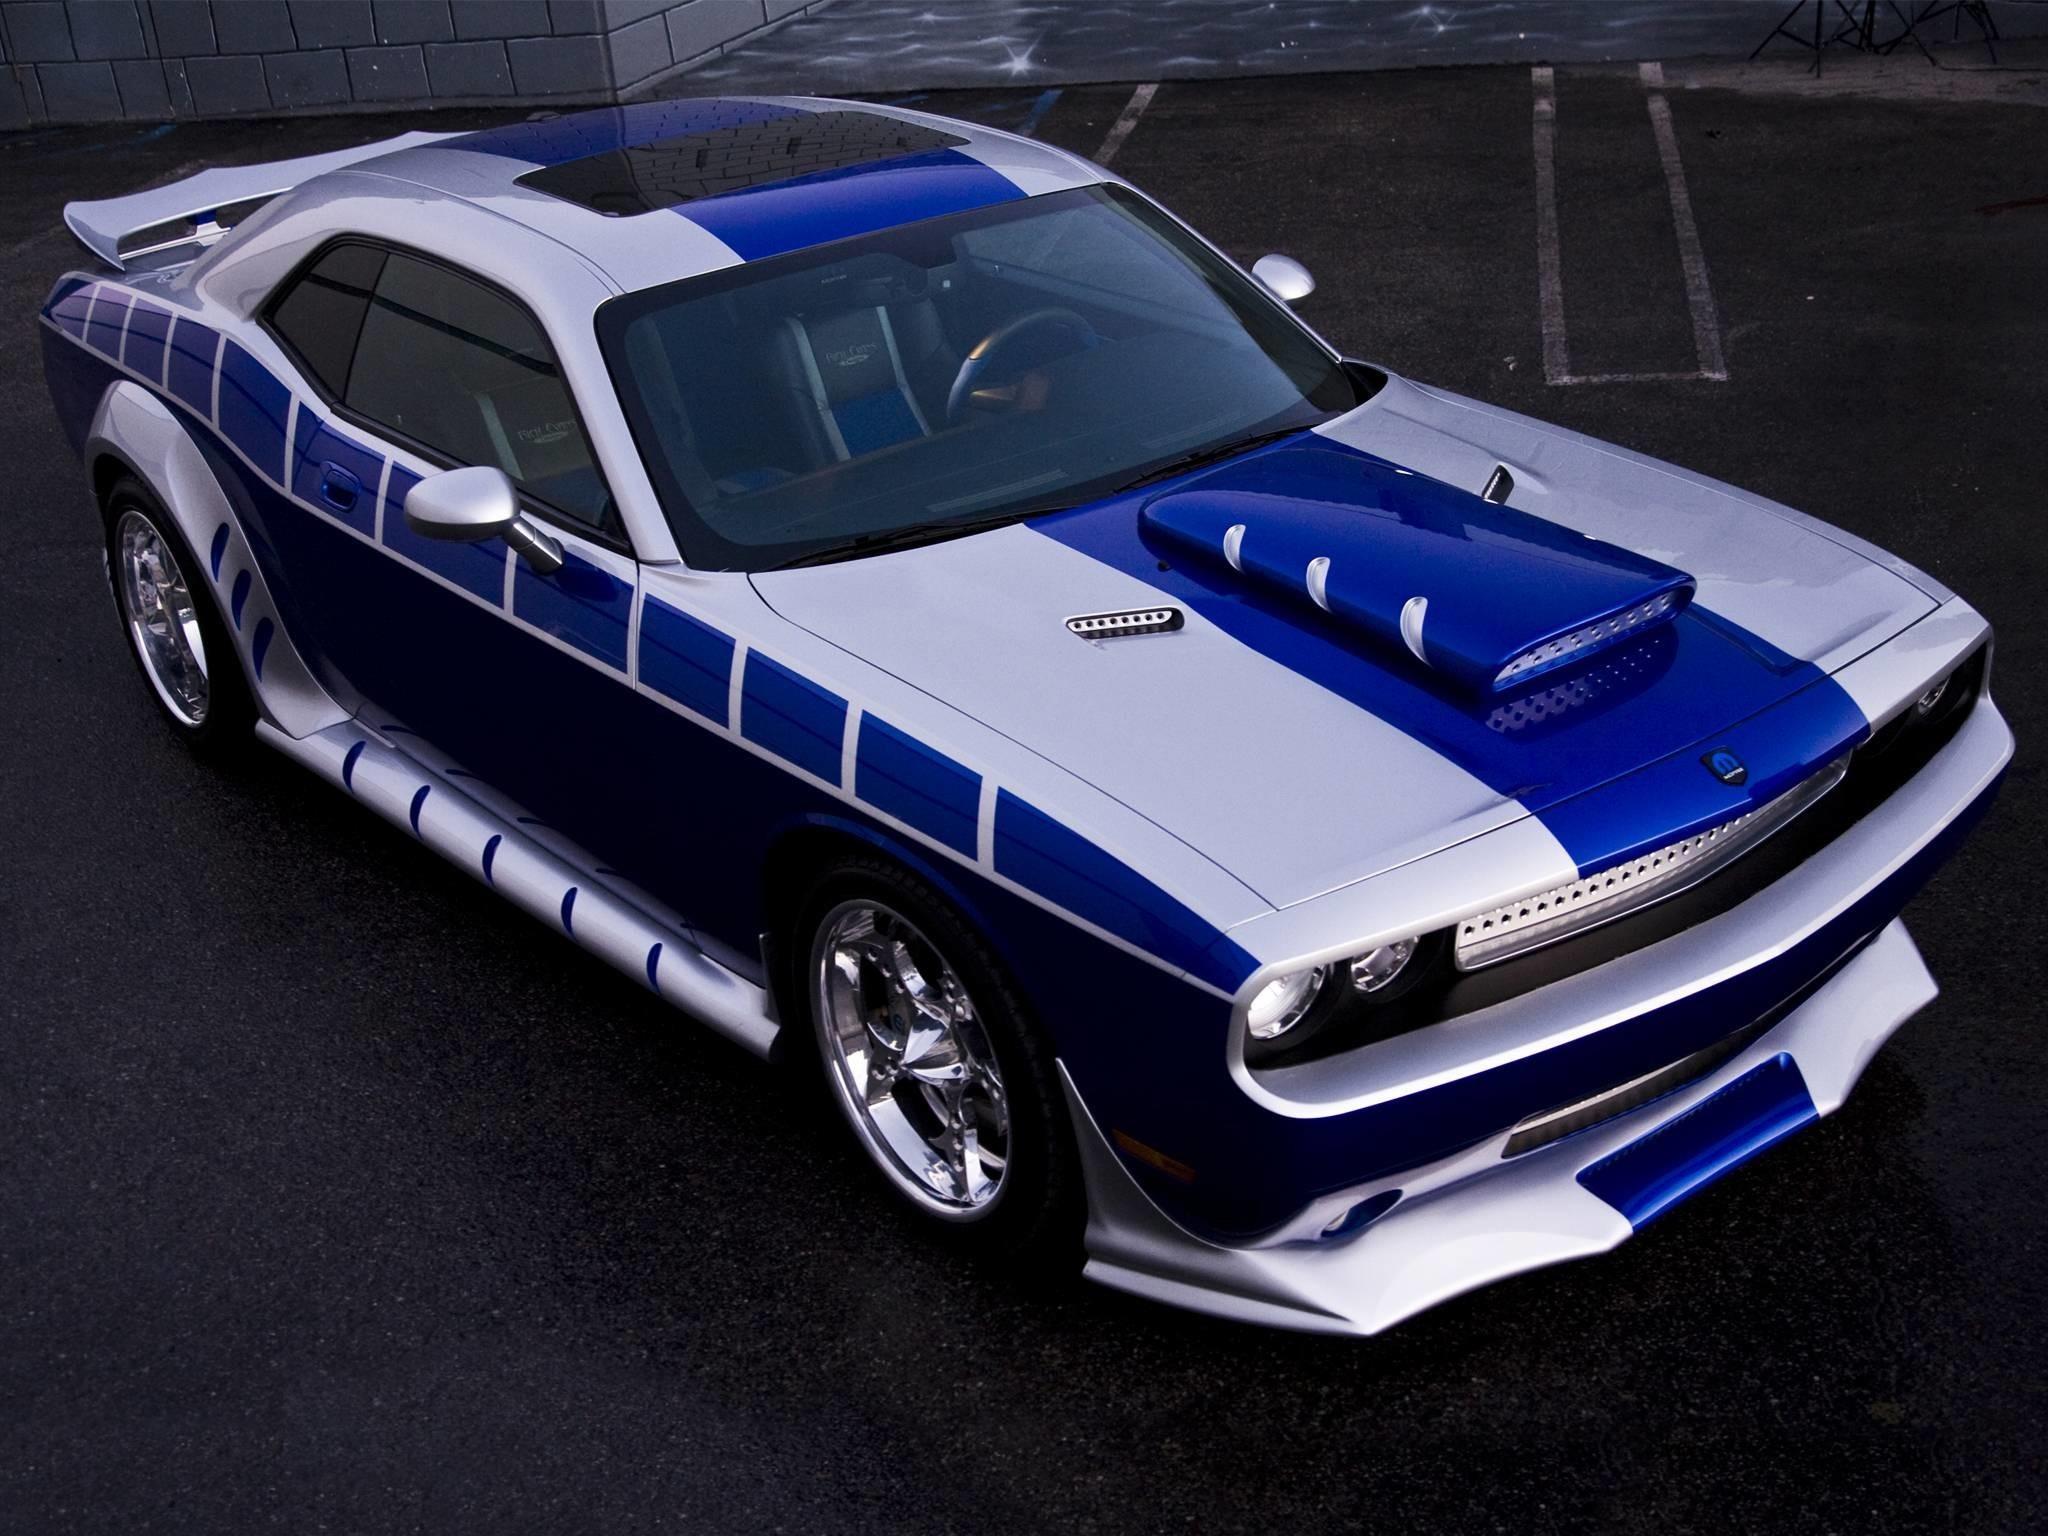 Free Download Dodge Challenger Mopar Hd Wallpaper Lowrider Custom Design Dodge Challenger 2048x1536 Wallpaper Teahub Io